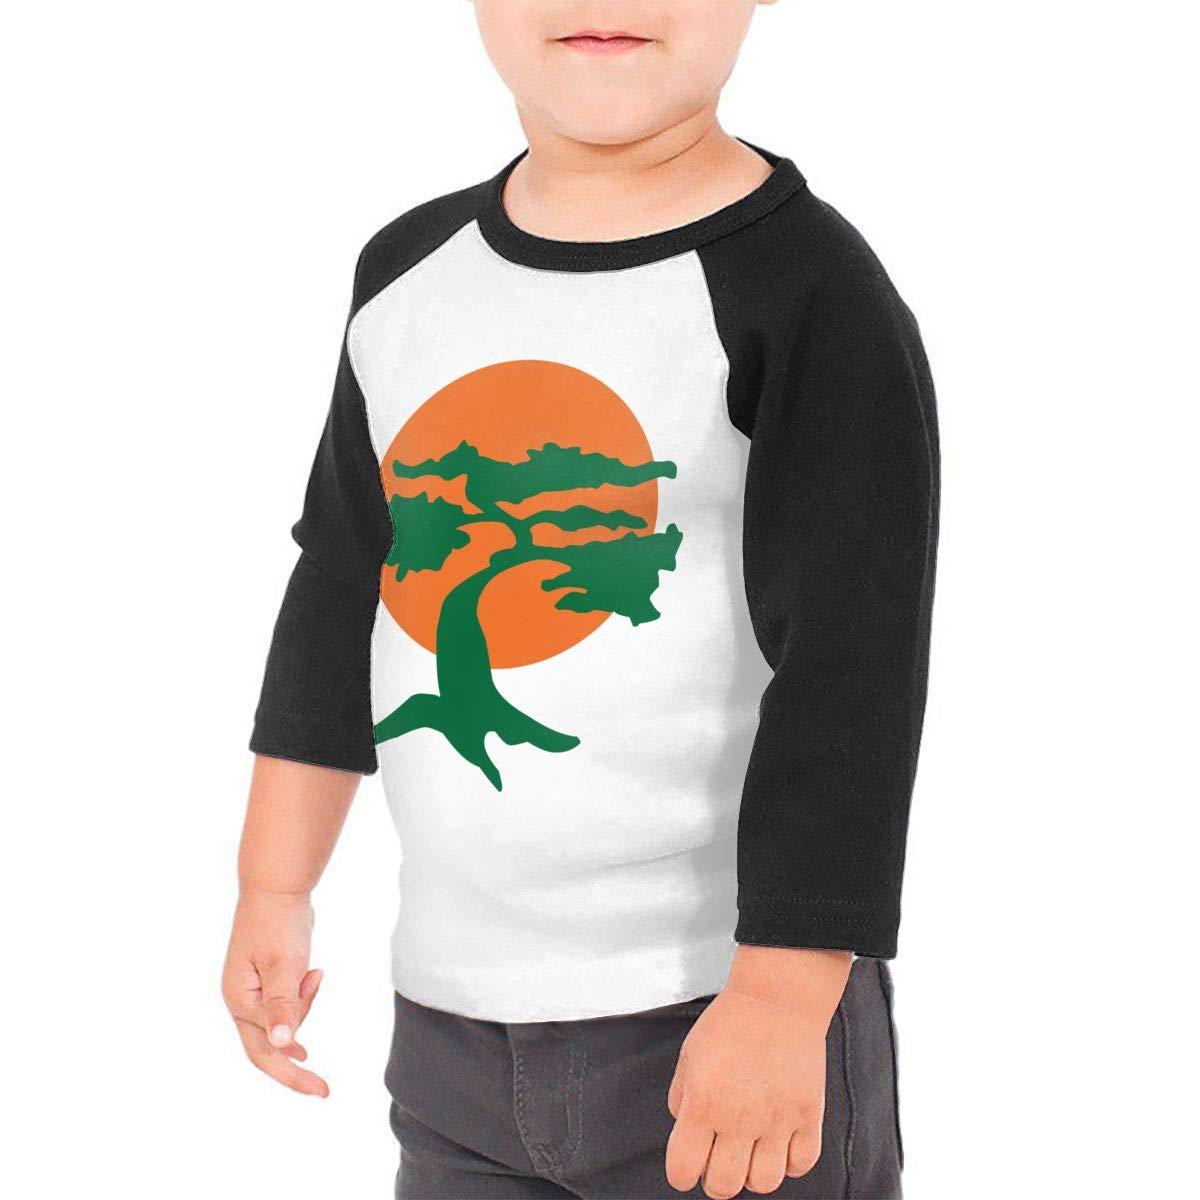 Yimo Japanese Bonsai Tree Unisex Toddler Baseball Jersey Contrast 3//4 Sleeves Tee